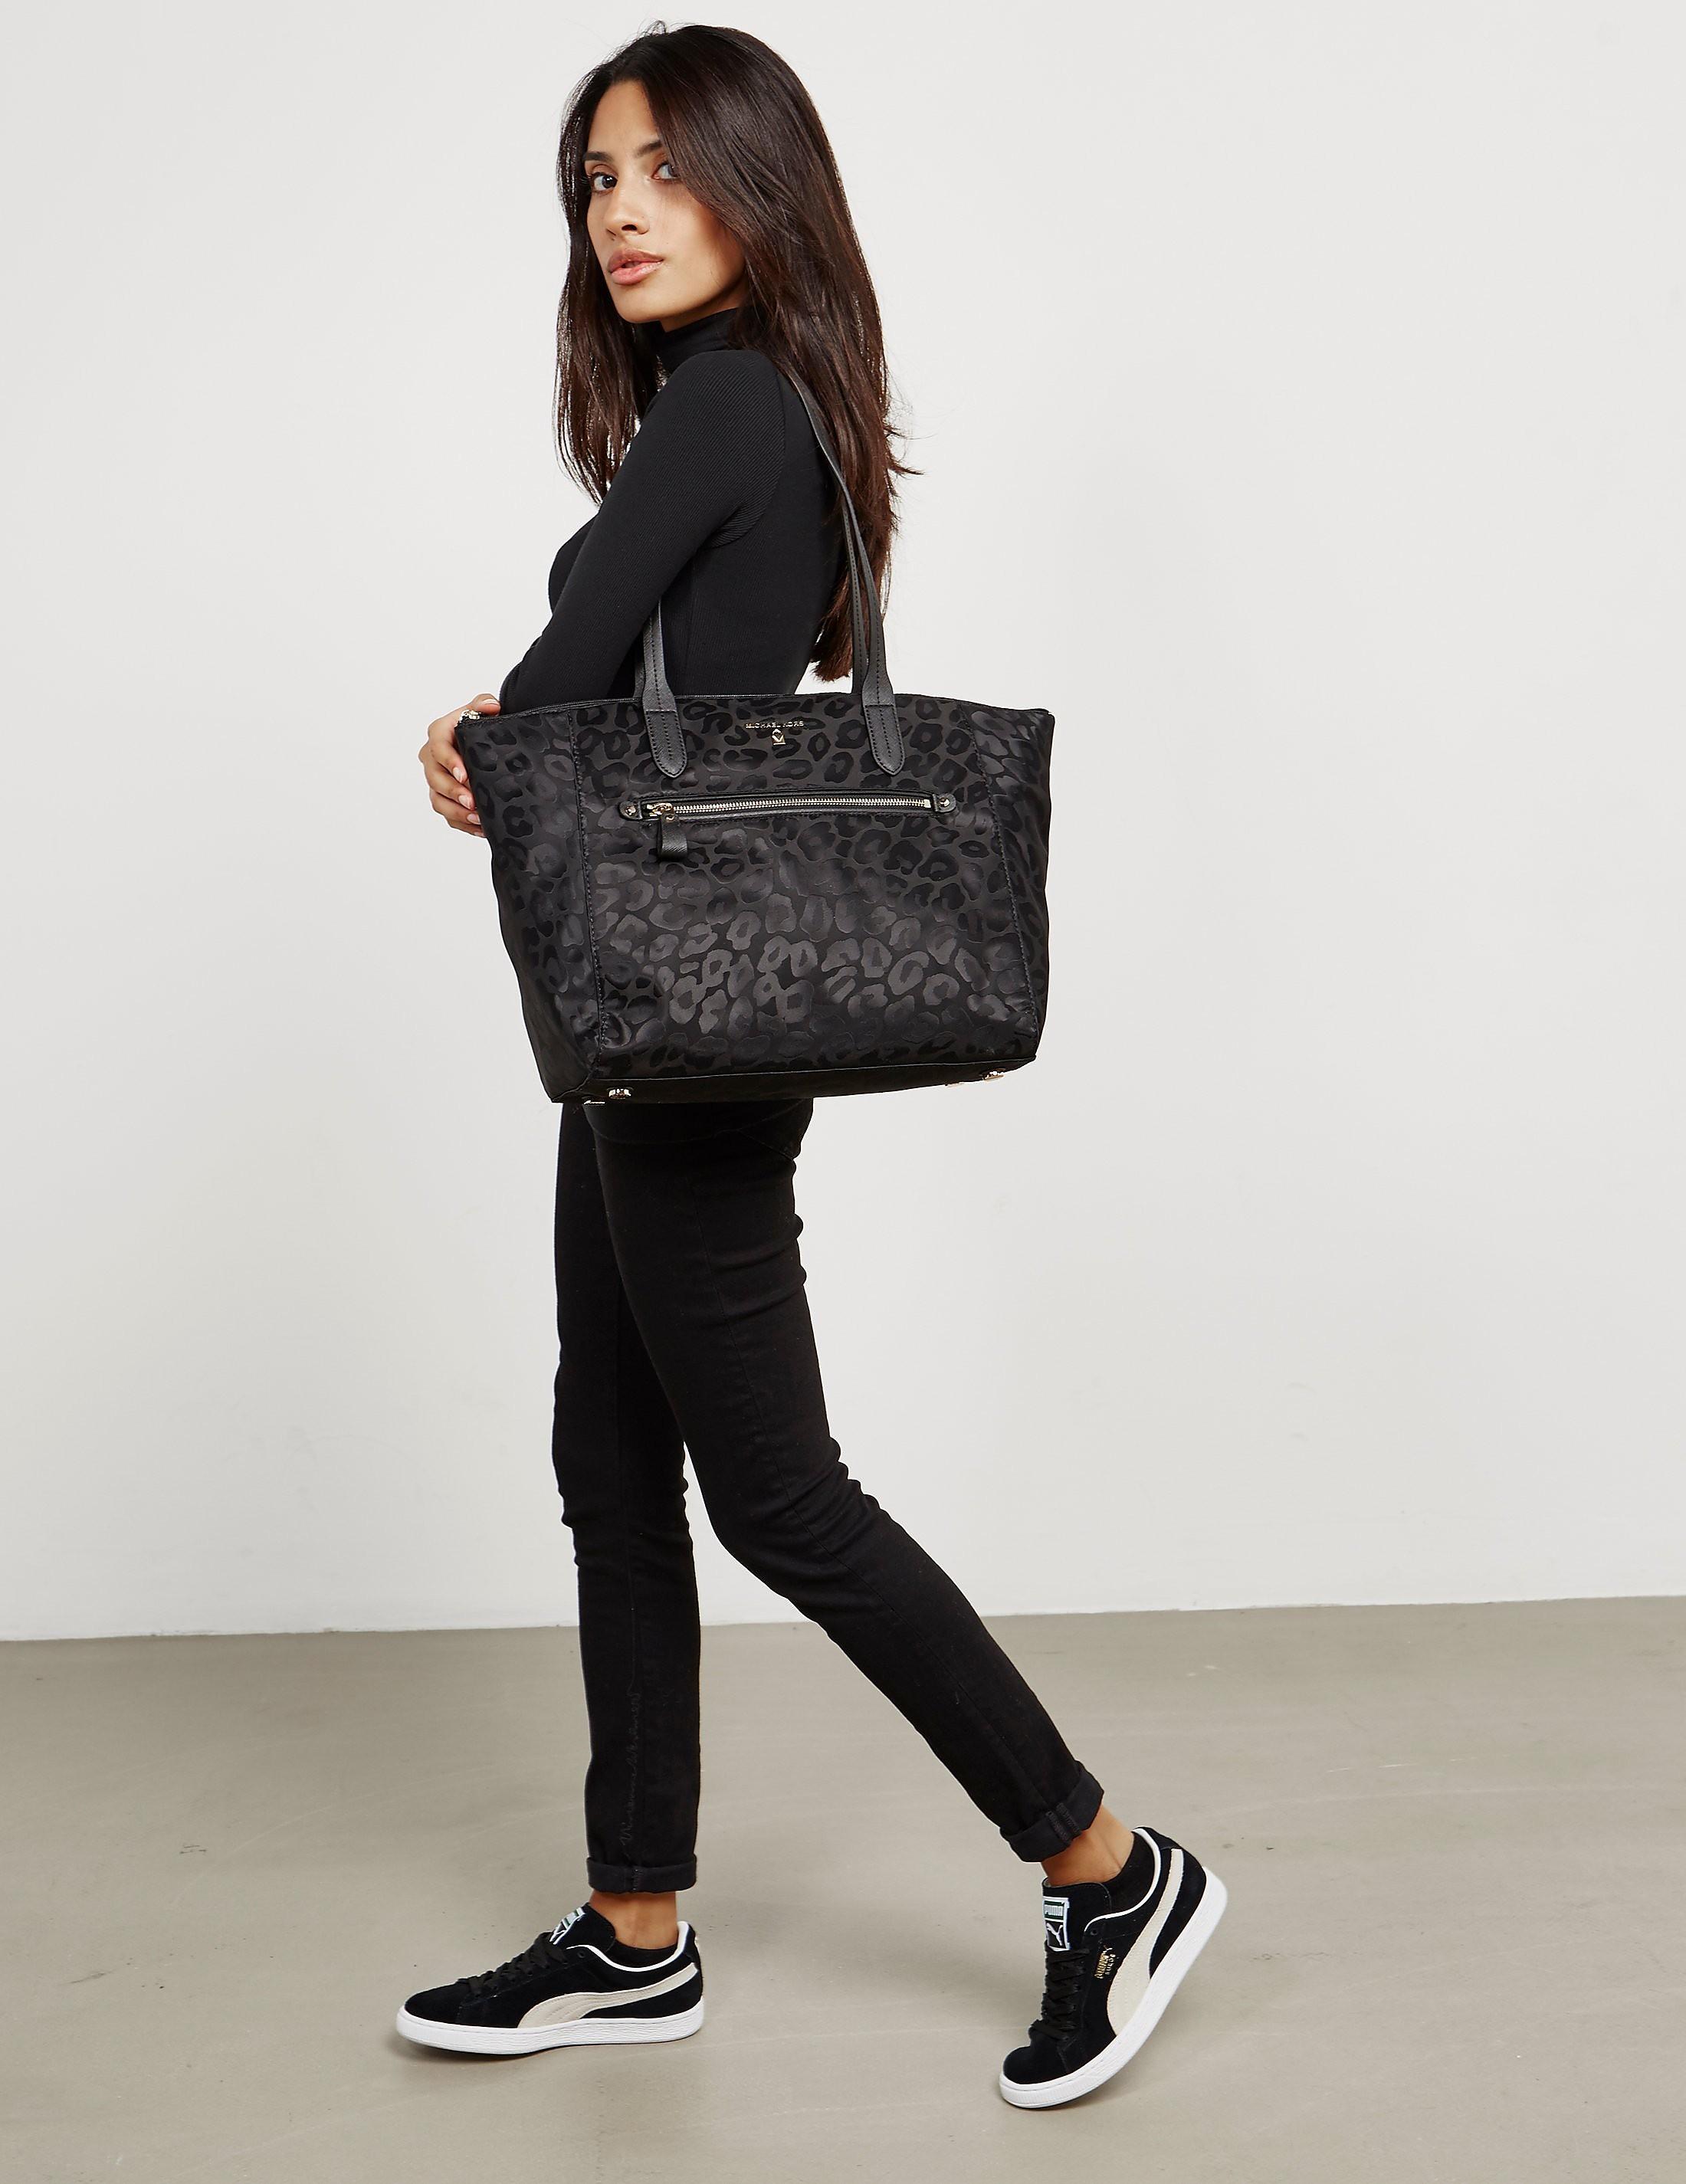 Michael Kors Kelsey Tote Bag